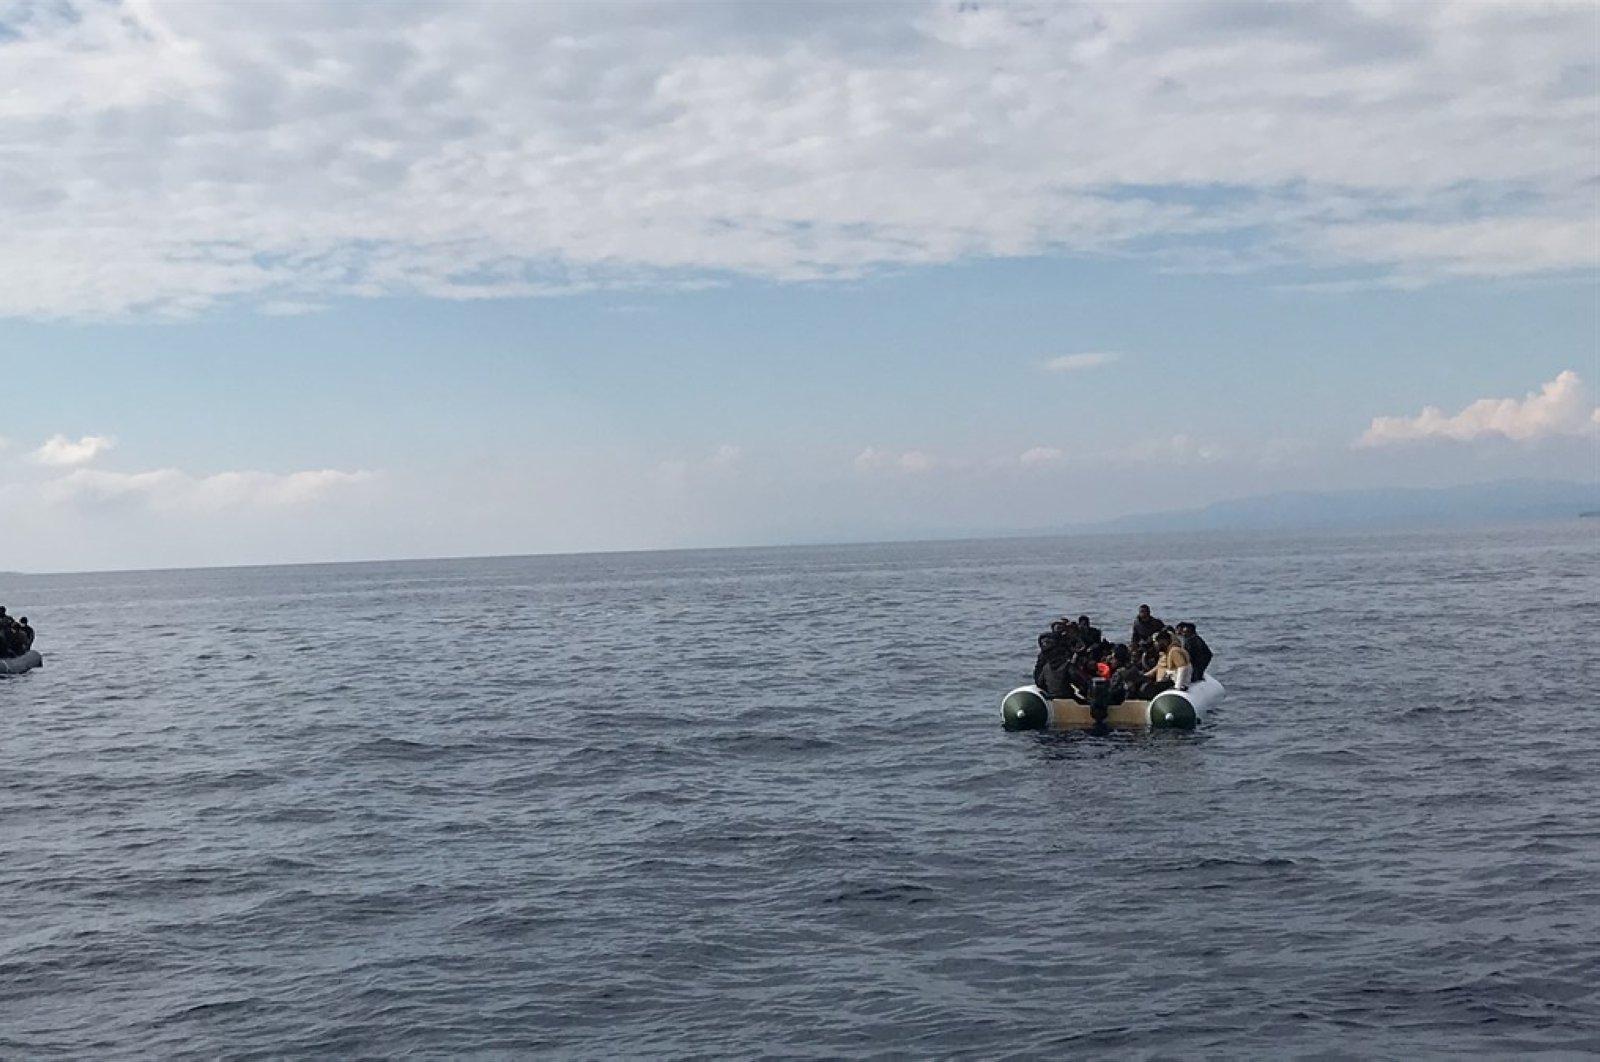 Turkish Coast Guard Command rescues 85 migrants and refugees off Çanakkale province's Aegean coast, June 4, 2020. (AA Photo)